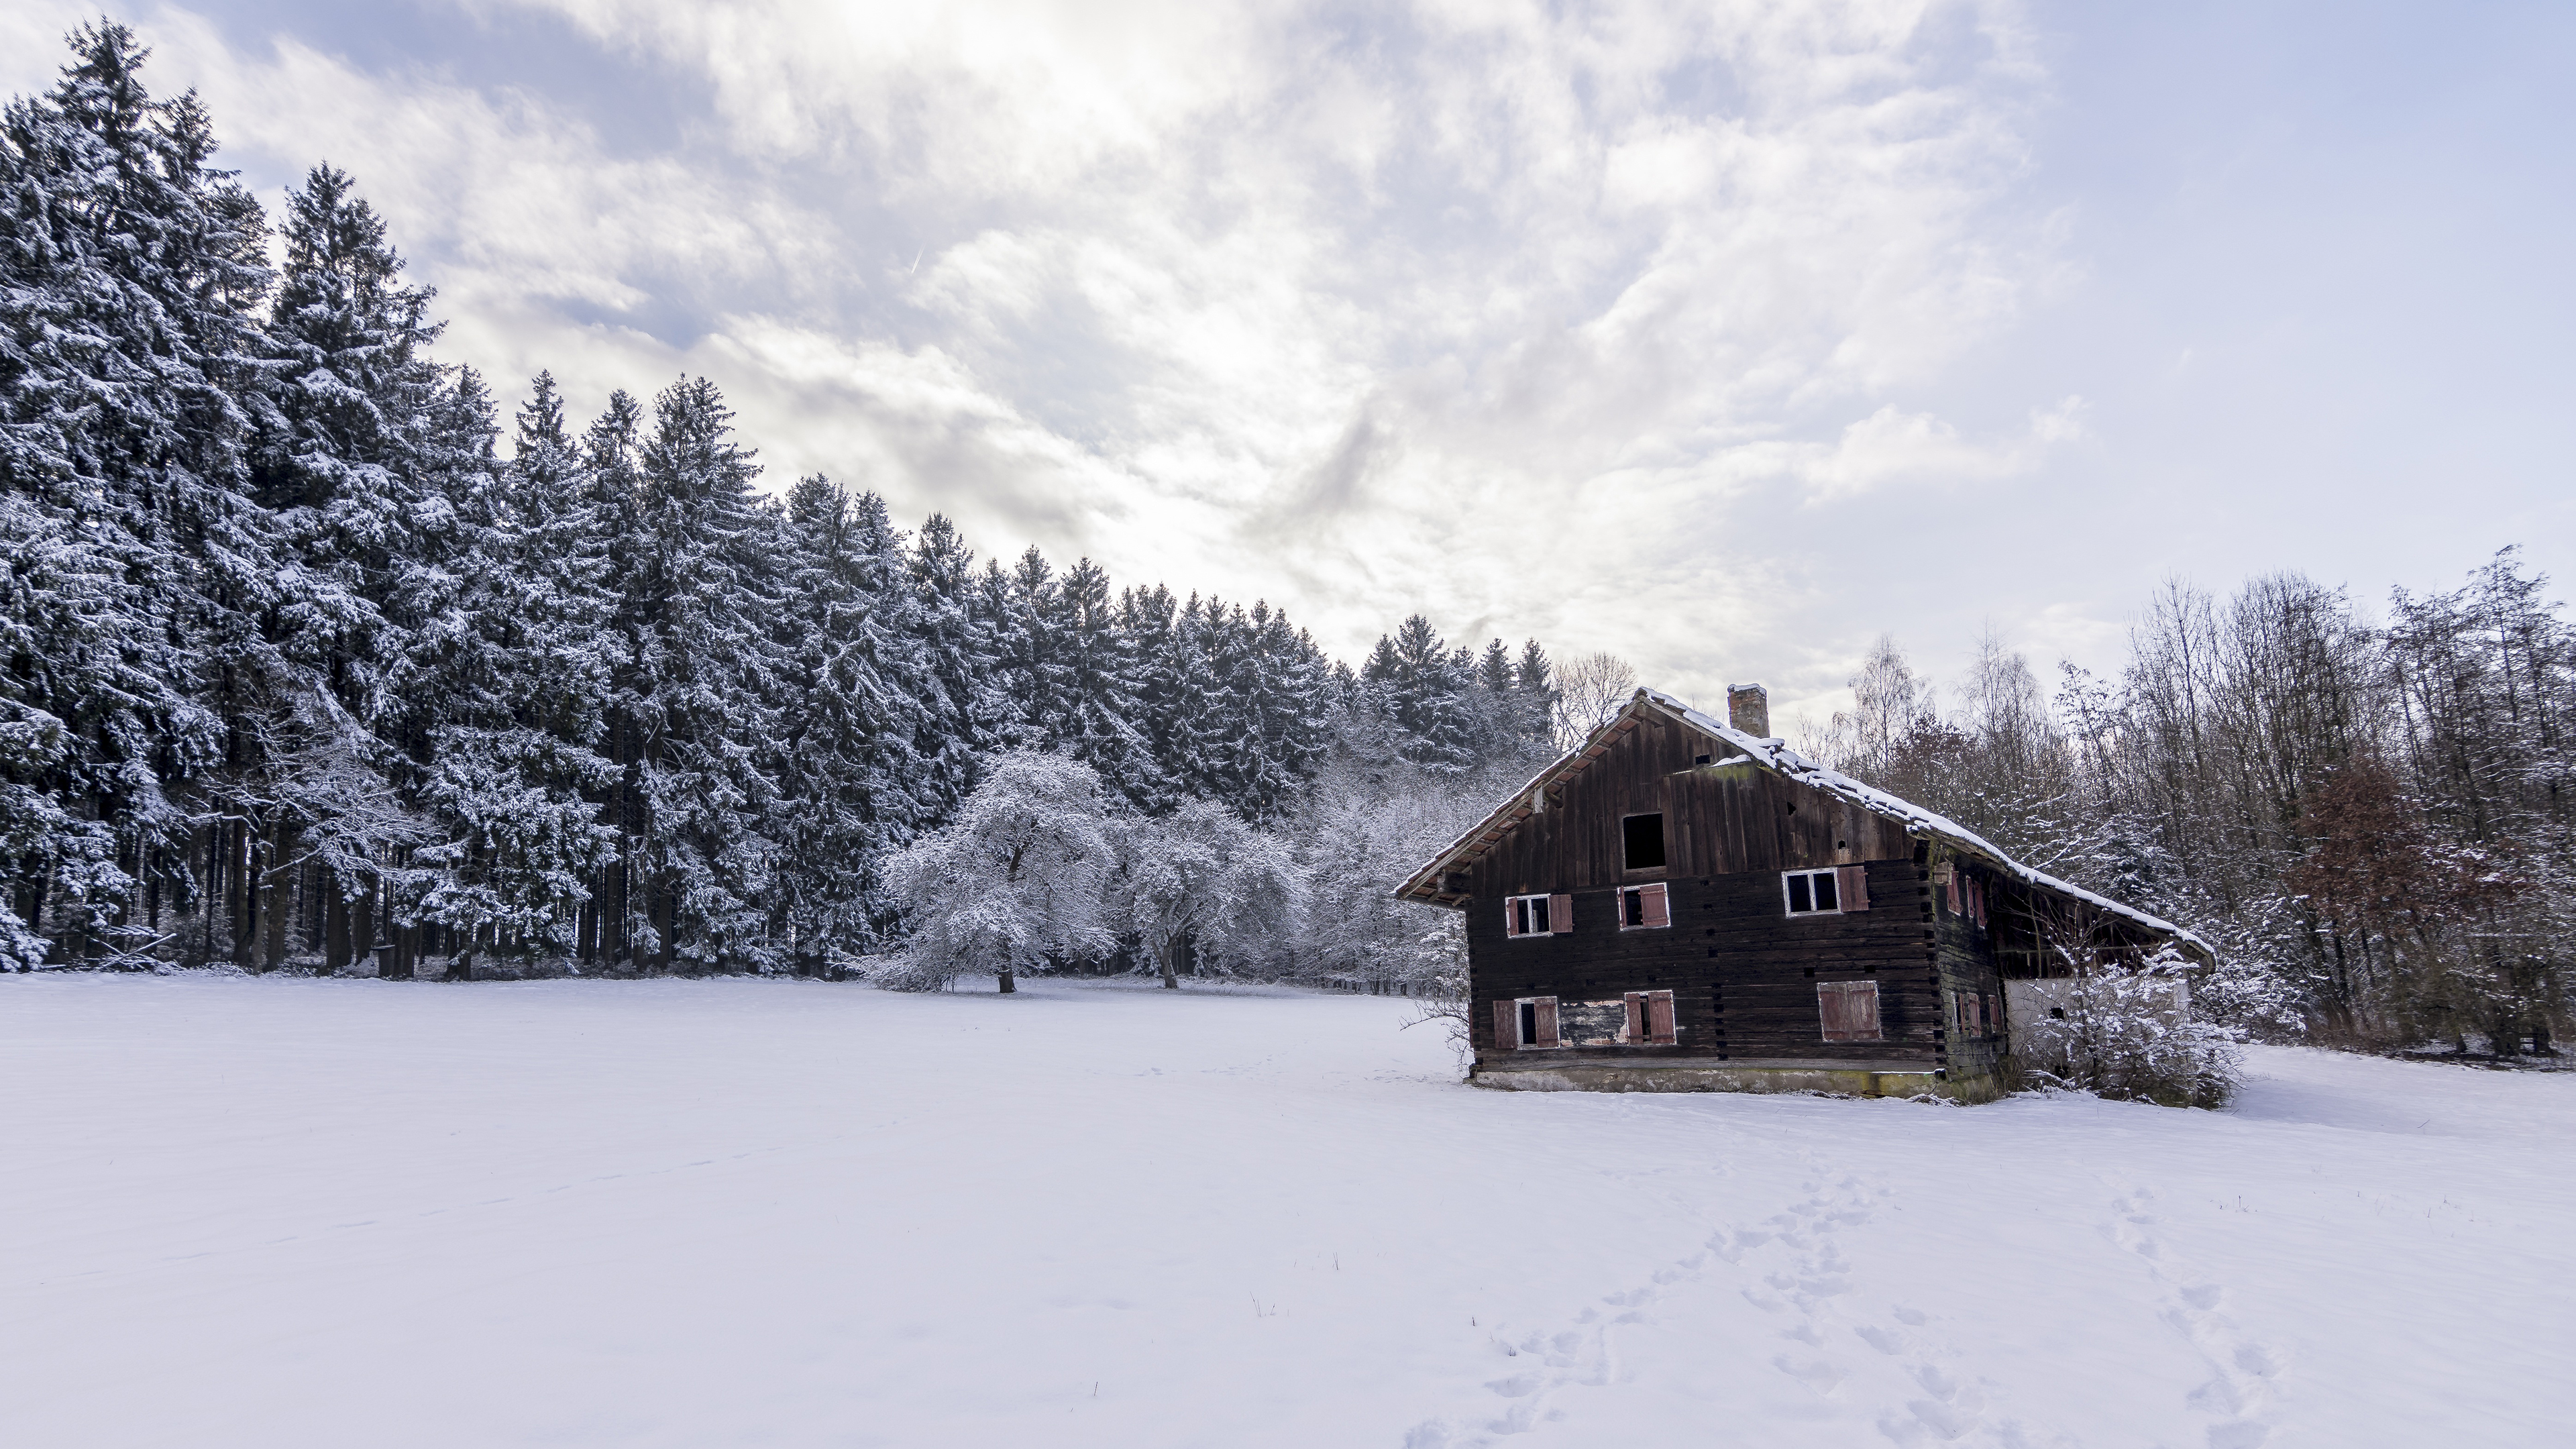 Cabin In The Snow Desktop Background